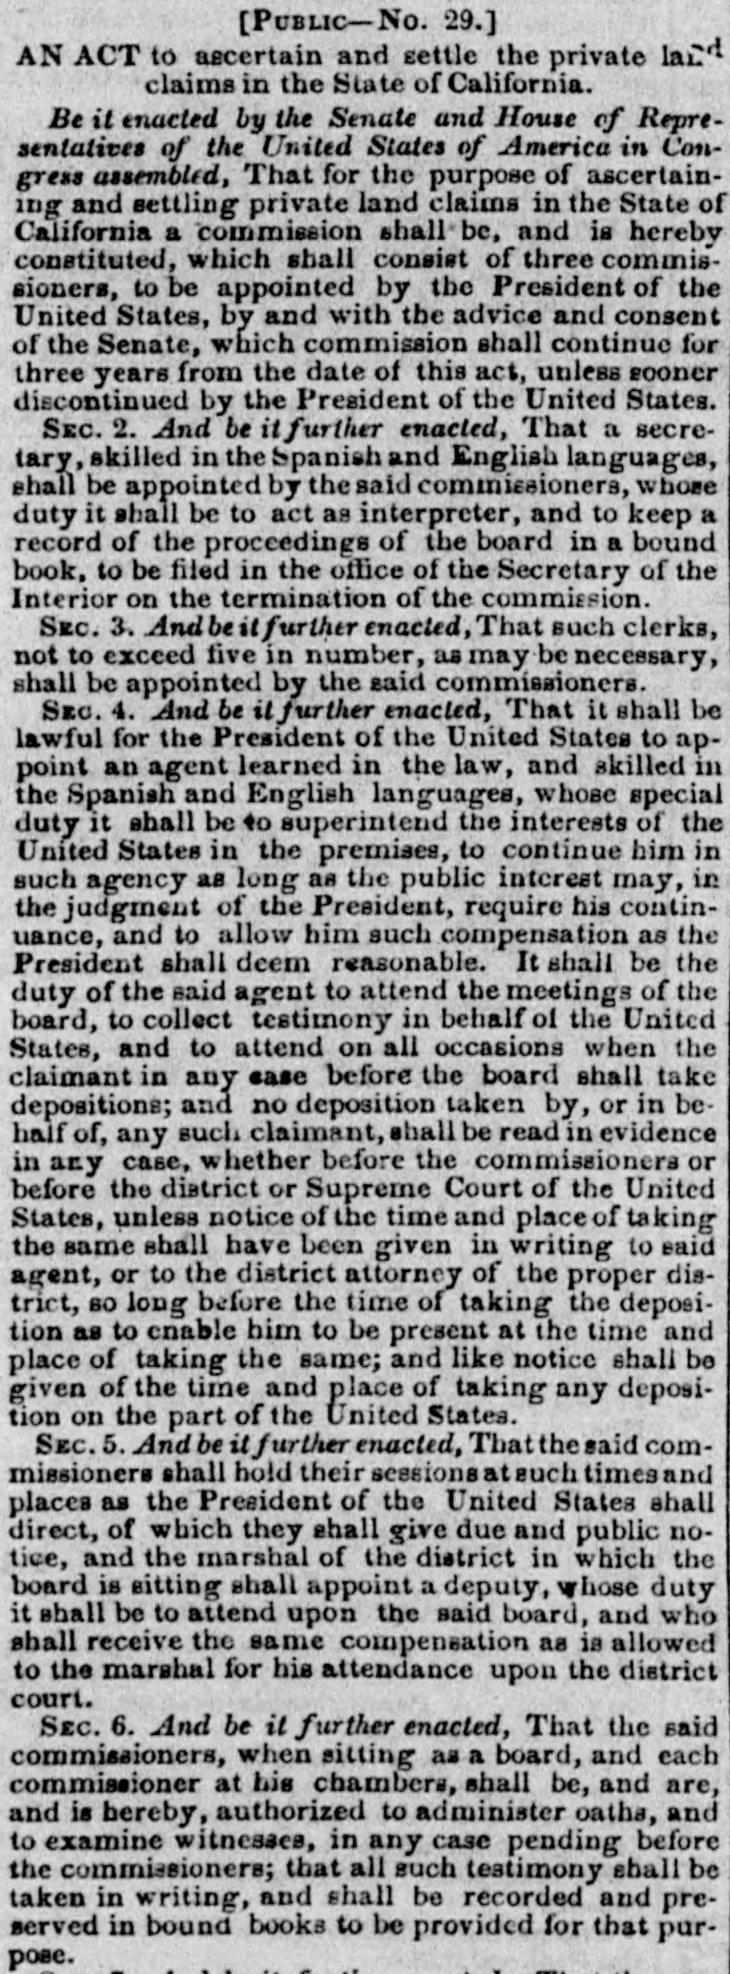 The_Daily_Republic_Tue__Mar_11__1851_